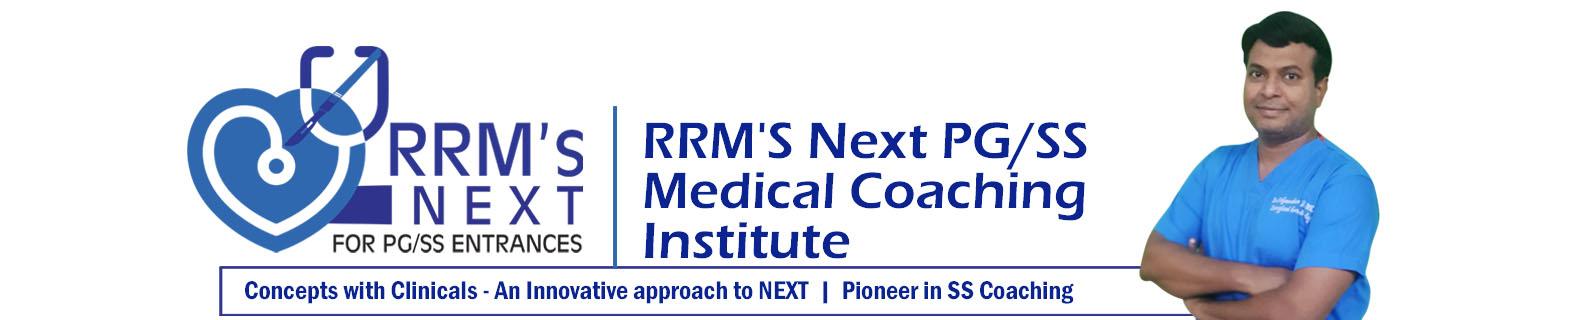 RRM Next